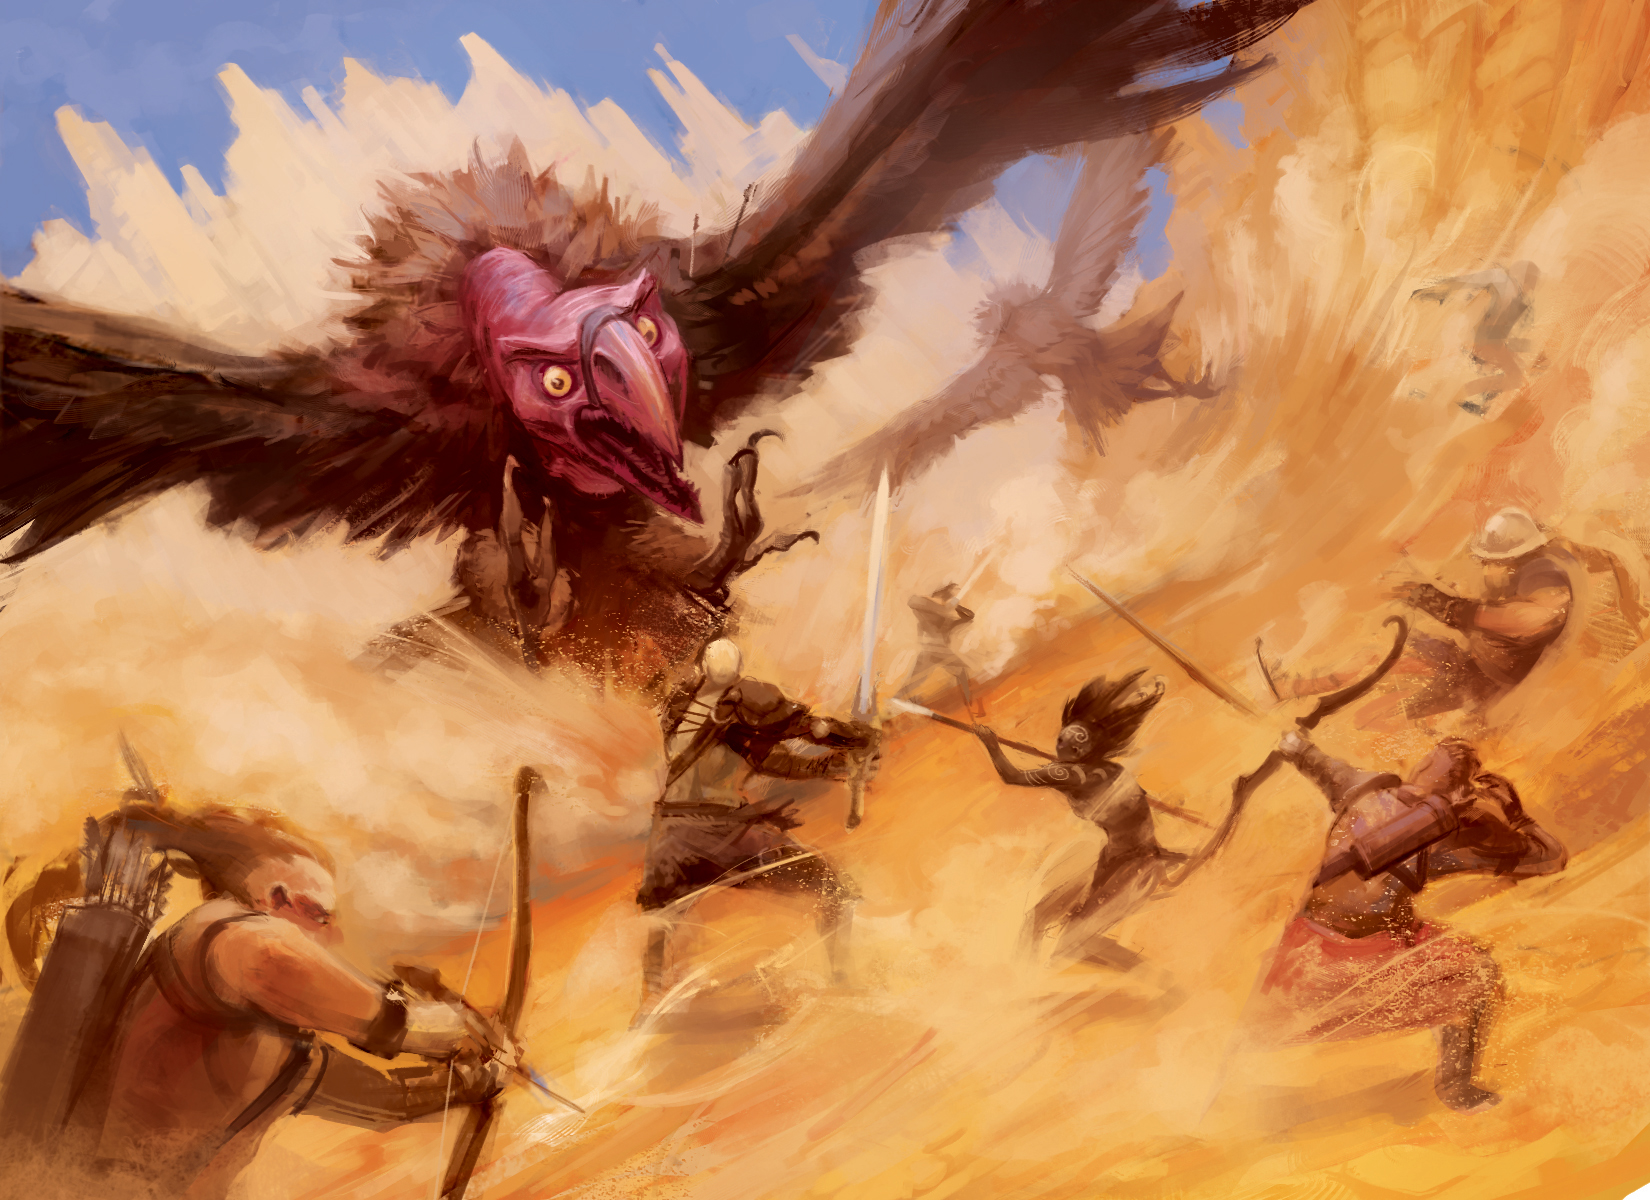 Rukh - Conan RPG Copyright © Modiphiüs Entertainment